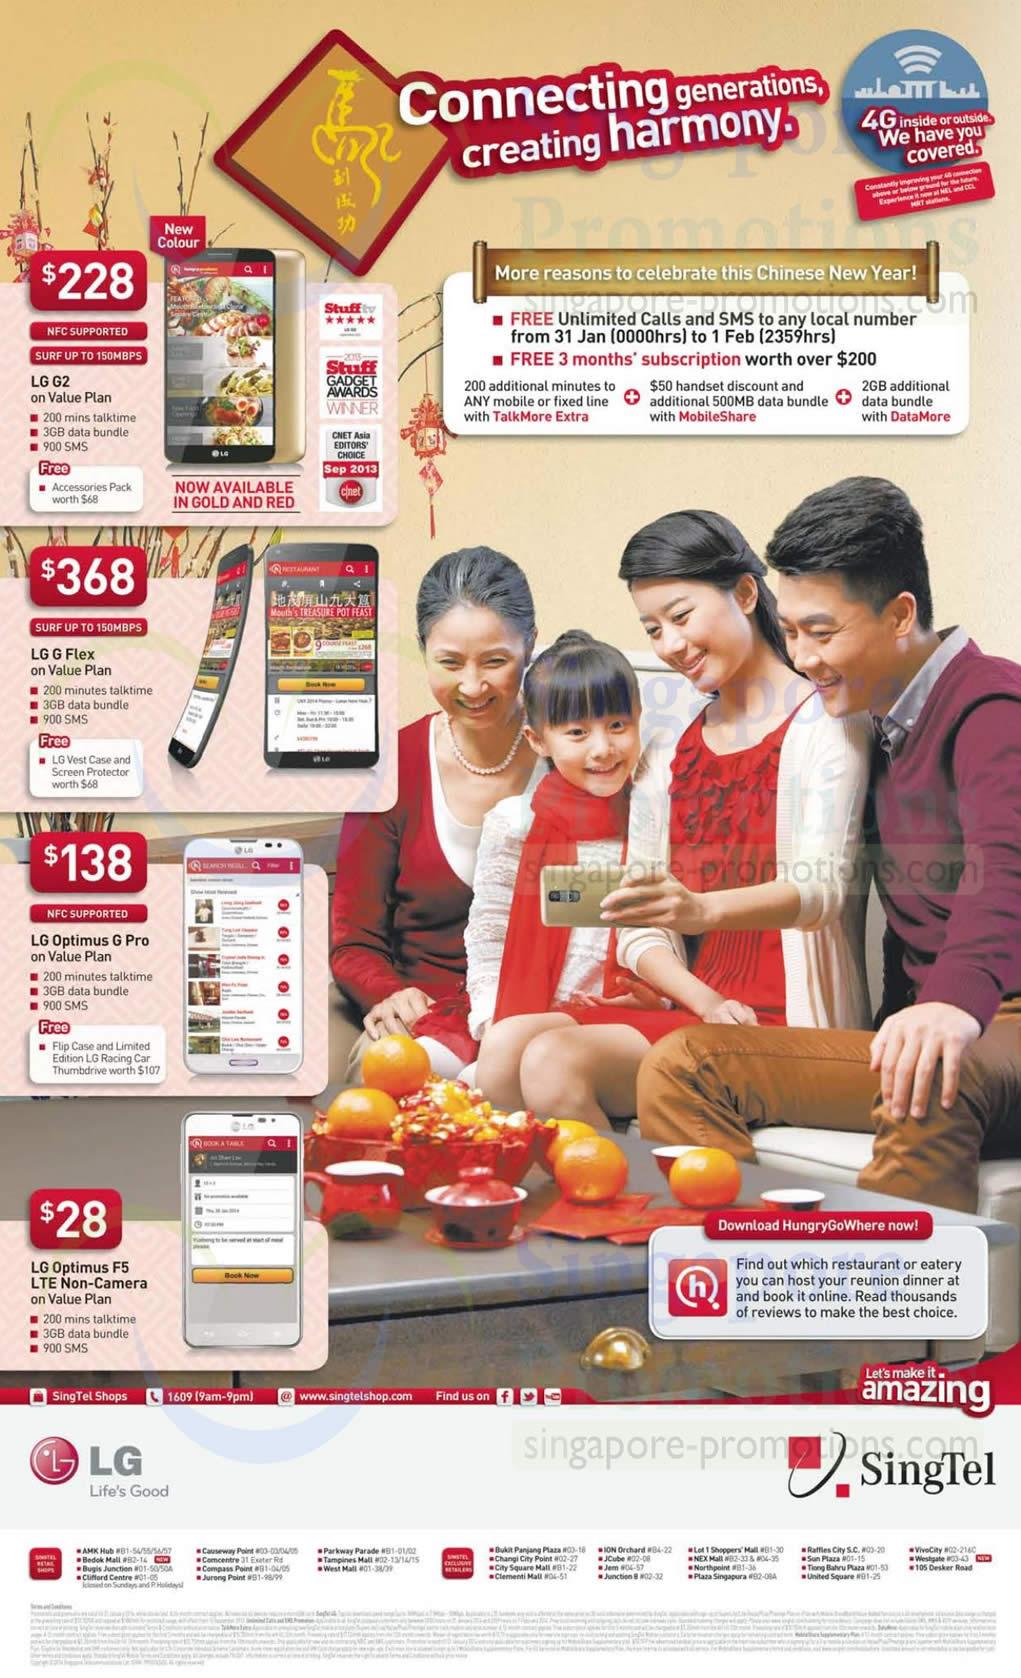 LG G2 Gold Red, LG G Flex, LG Optimus G Pro, LG Optimus F5 LTE, Free 3 Months Subscription